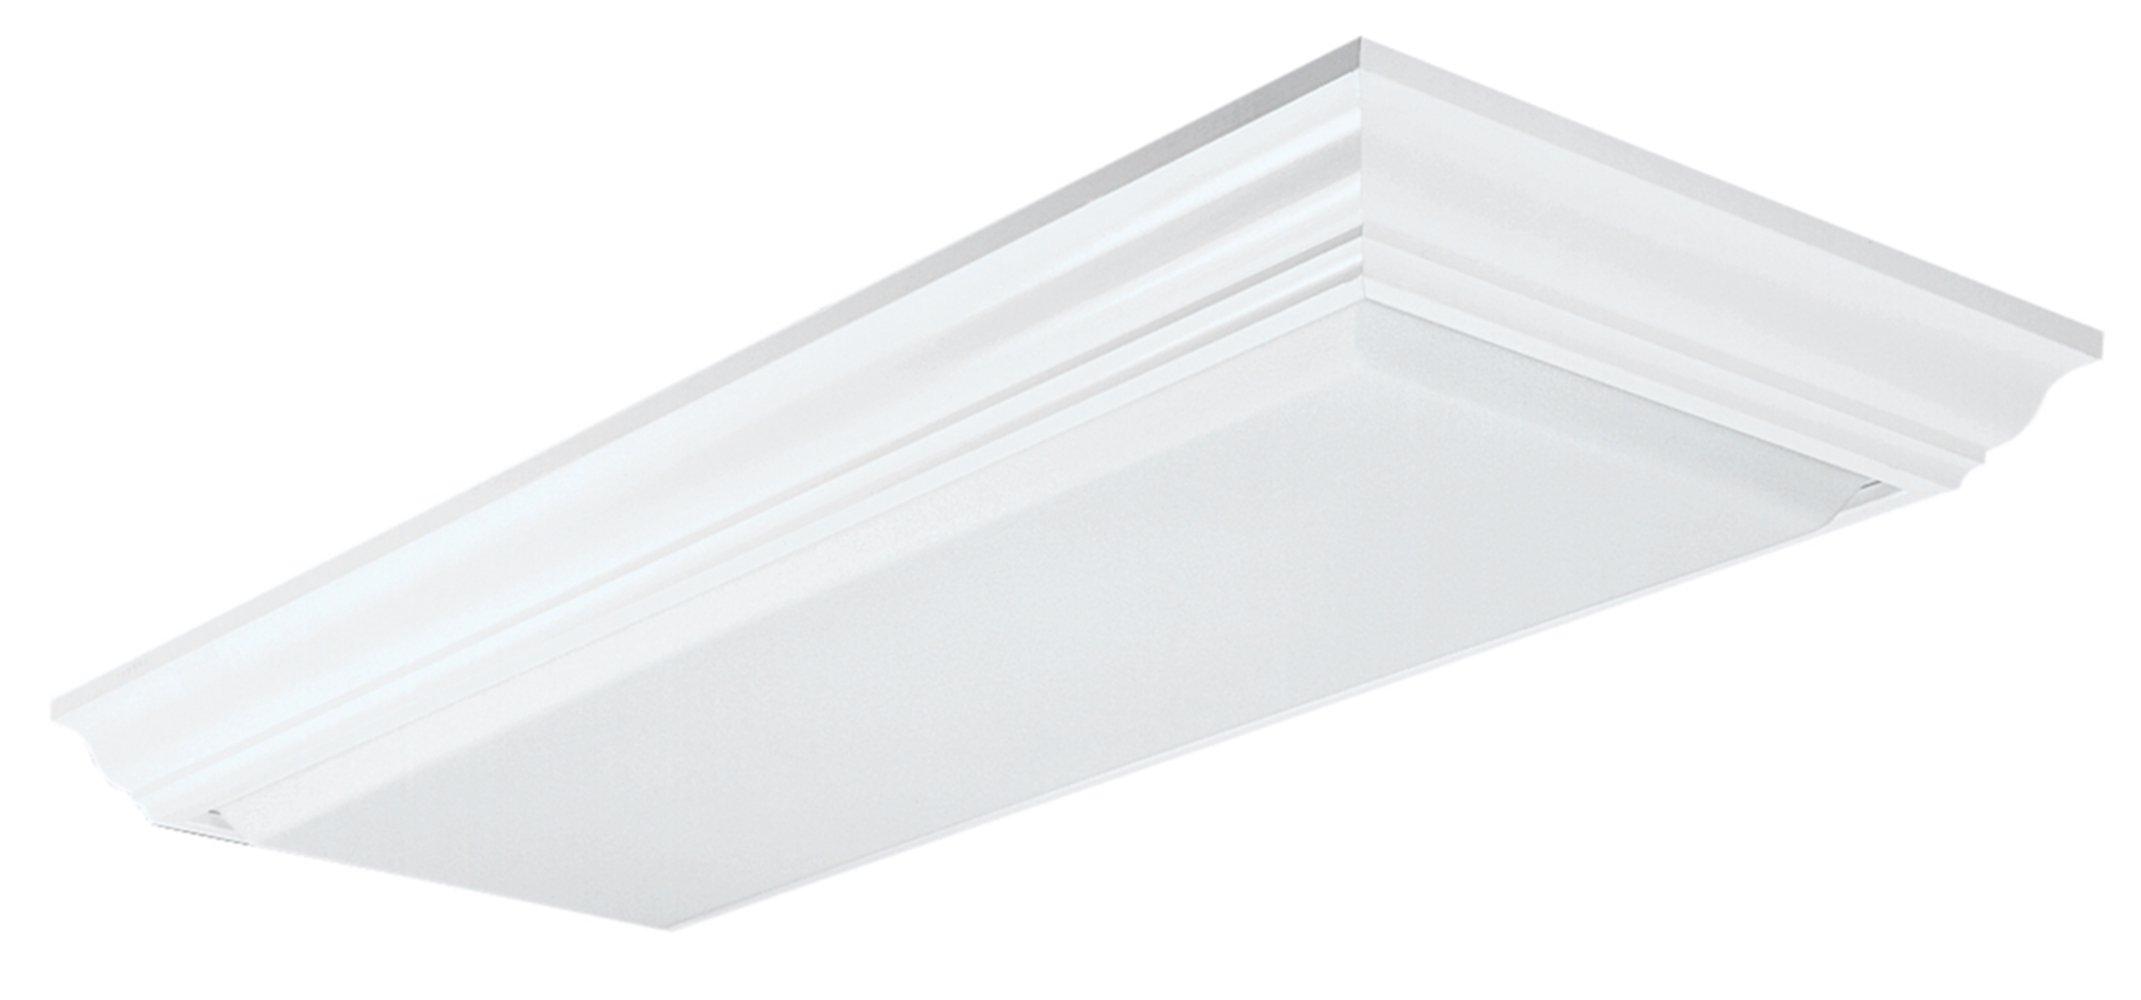 Lithonia Lighting 11432RE WH Cambridge Linear T8 Flush Mount Ceiling Light for Kitchen | Attic | Basement | Home, White